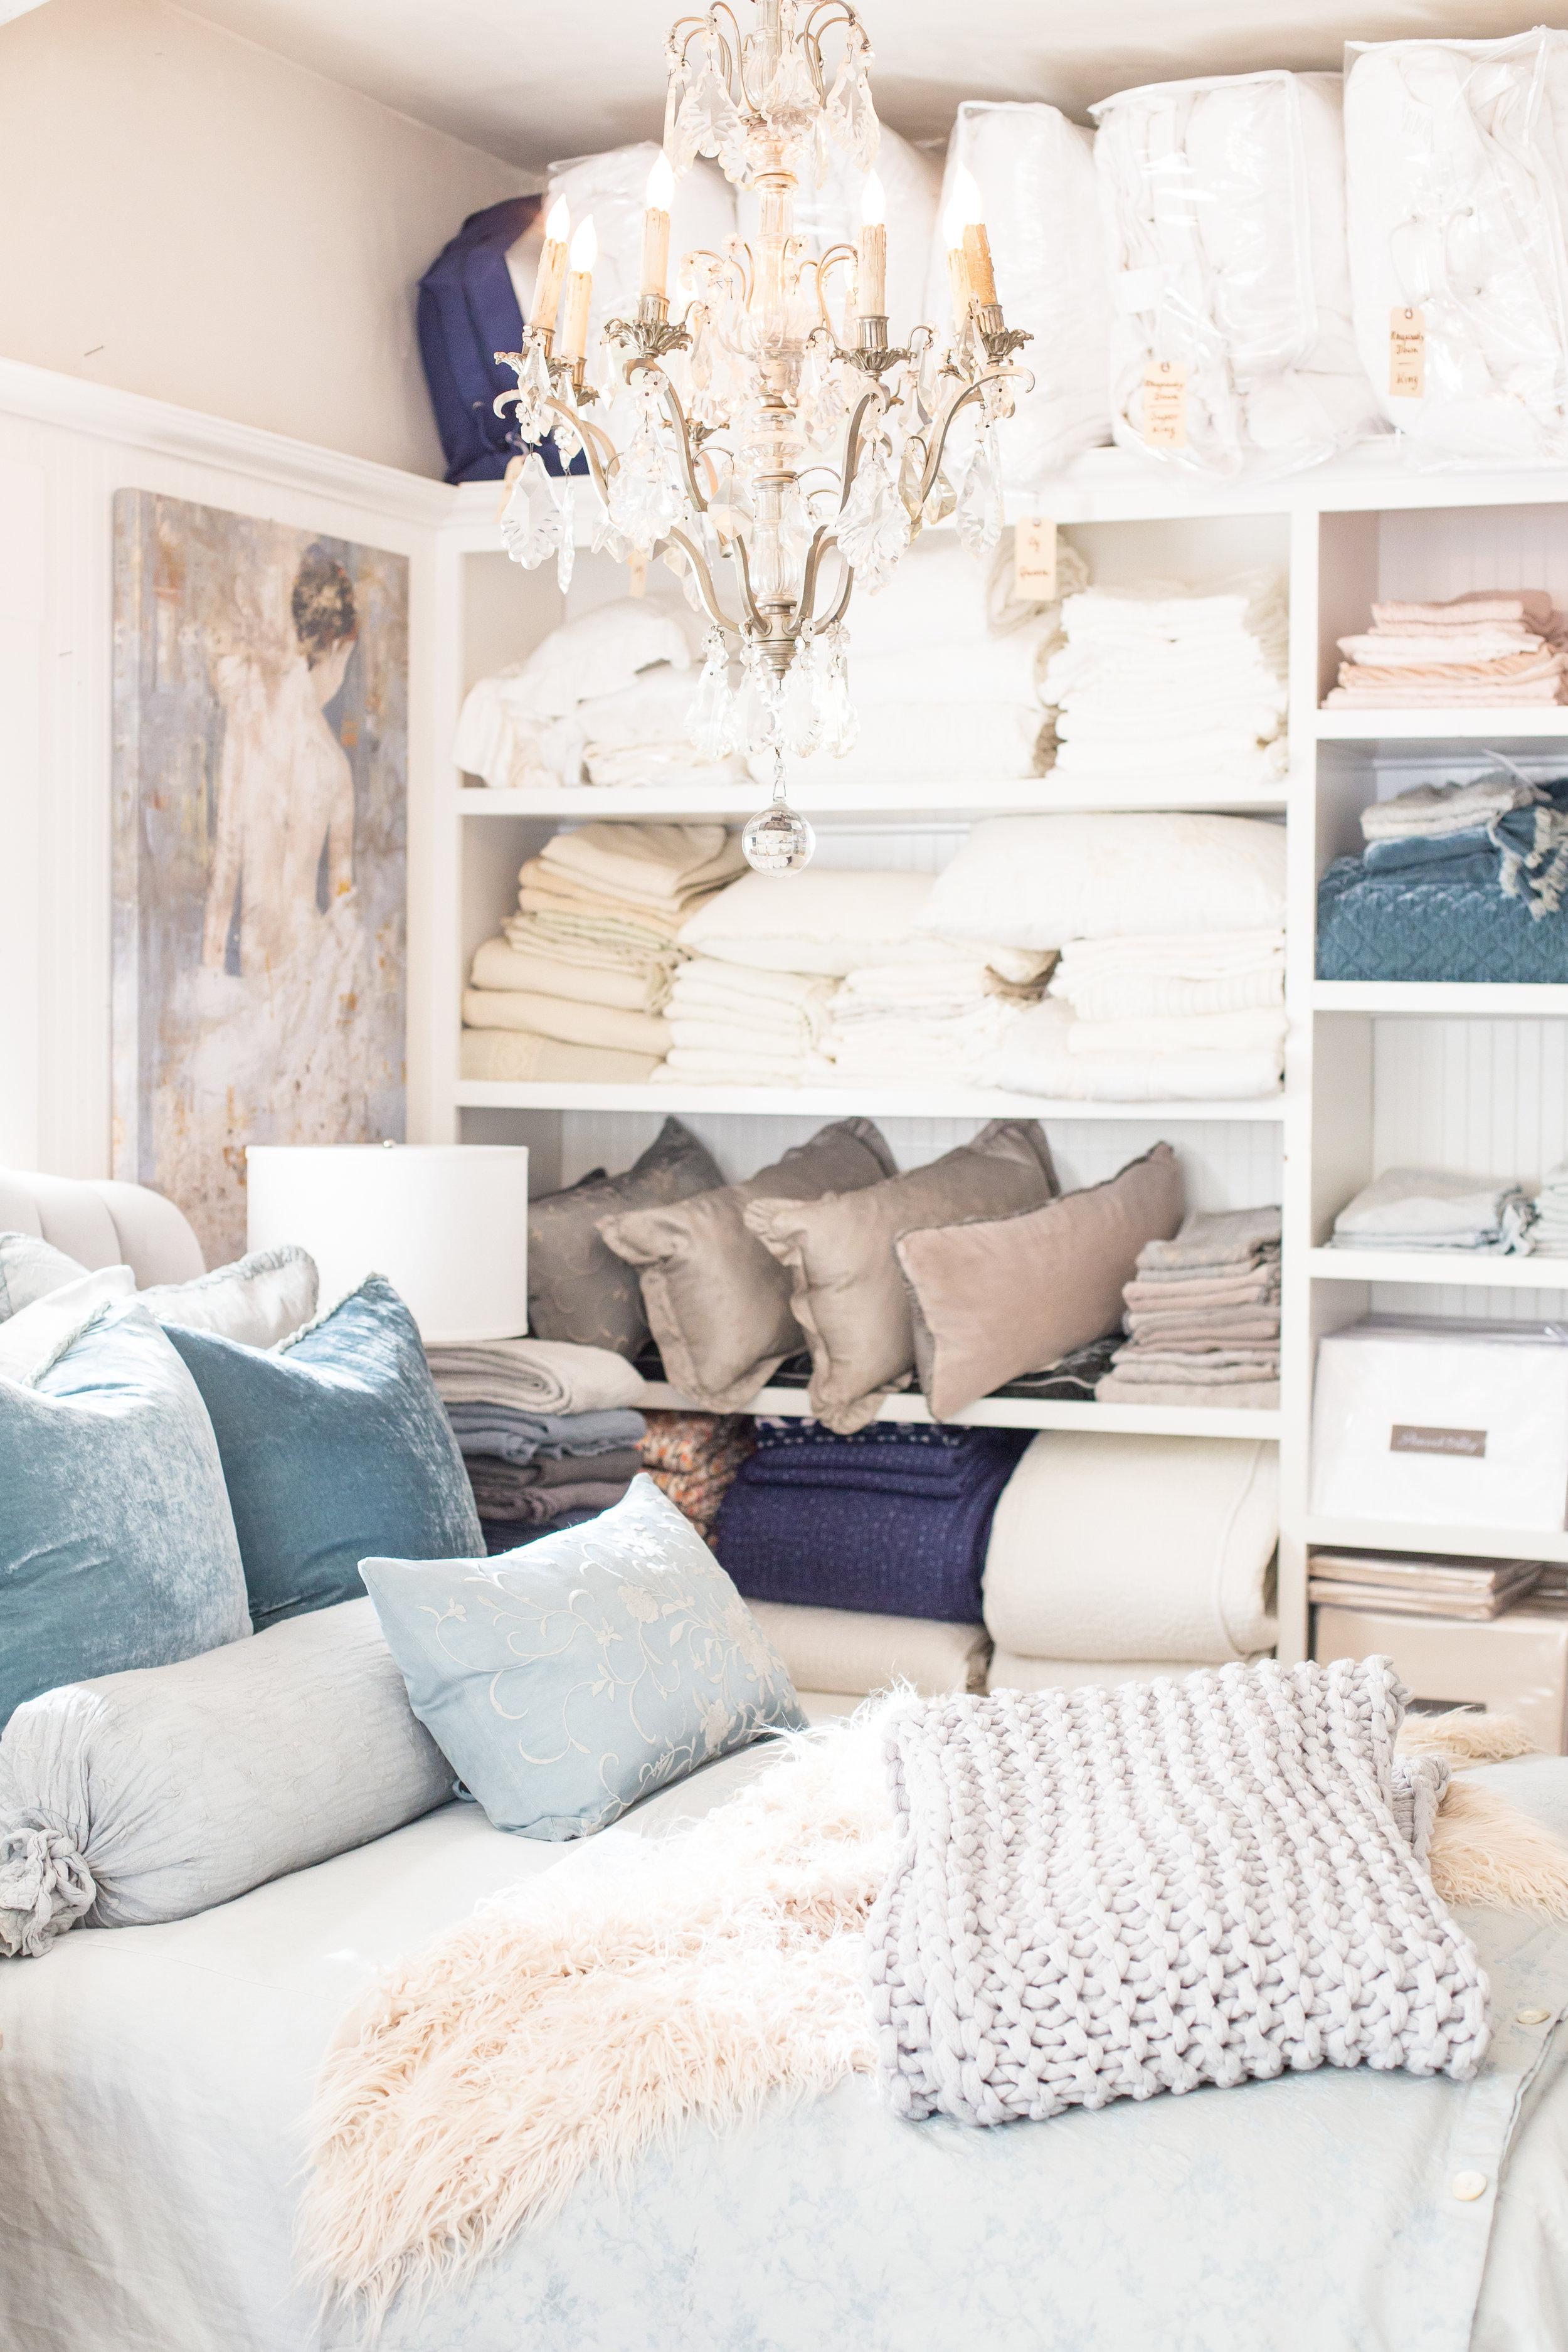 Luxury bedding display